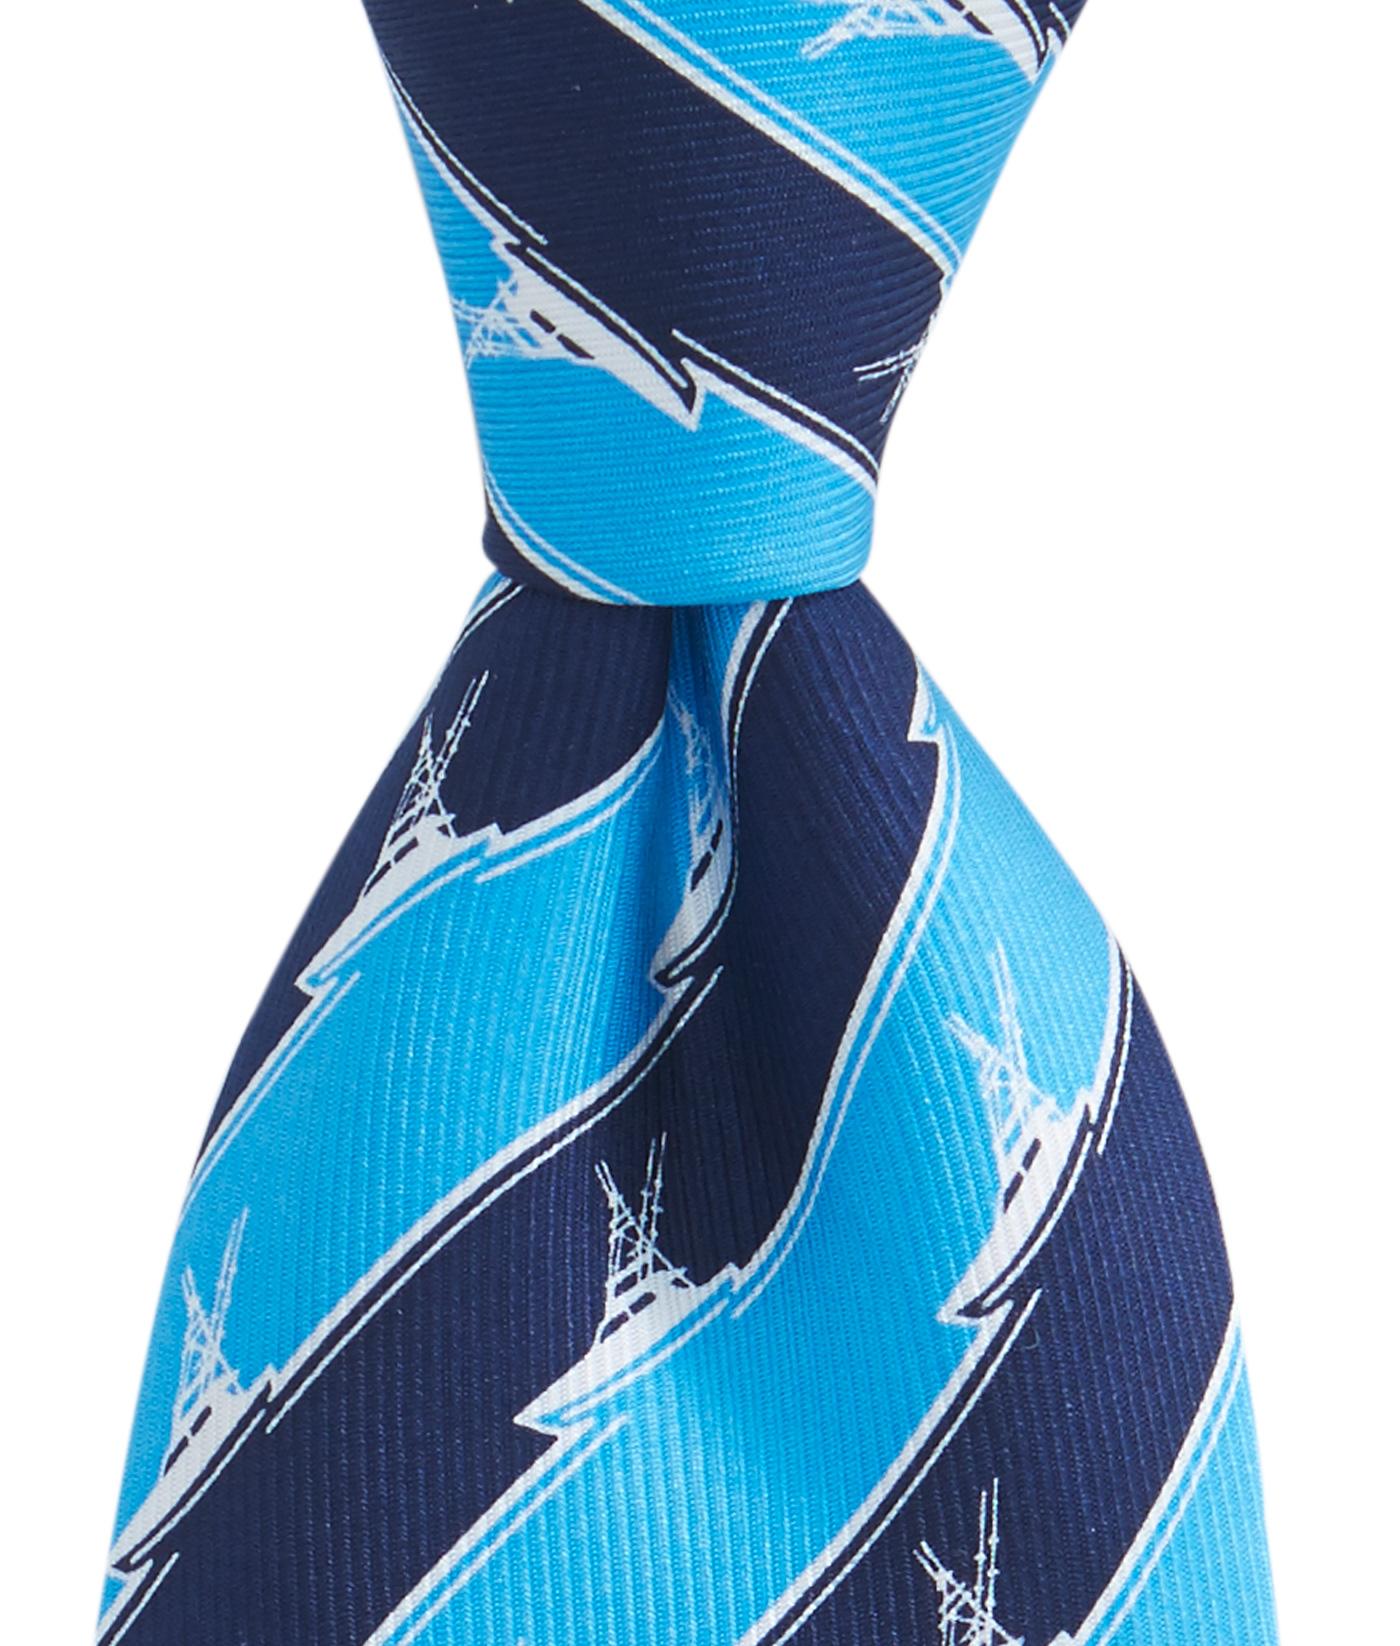 Vineyard Vines Men Sportsfishing Silk NeckTie Pink /& Blue Stripped Style 1T3161